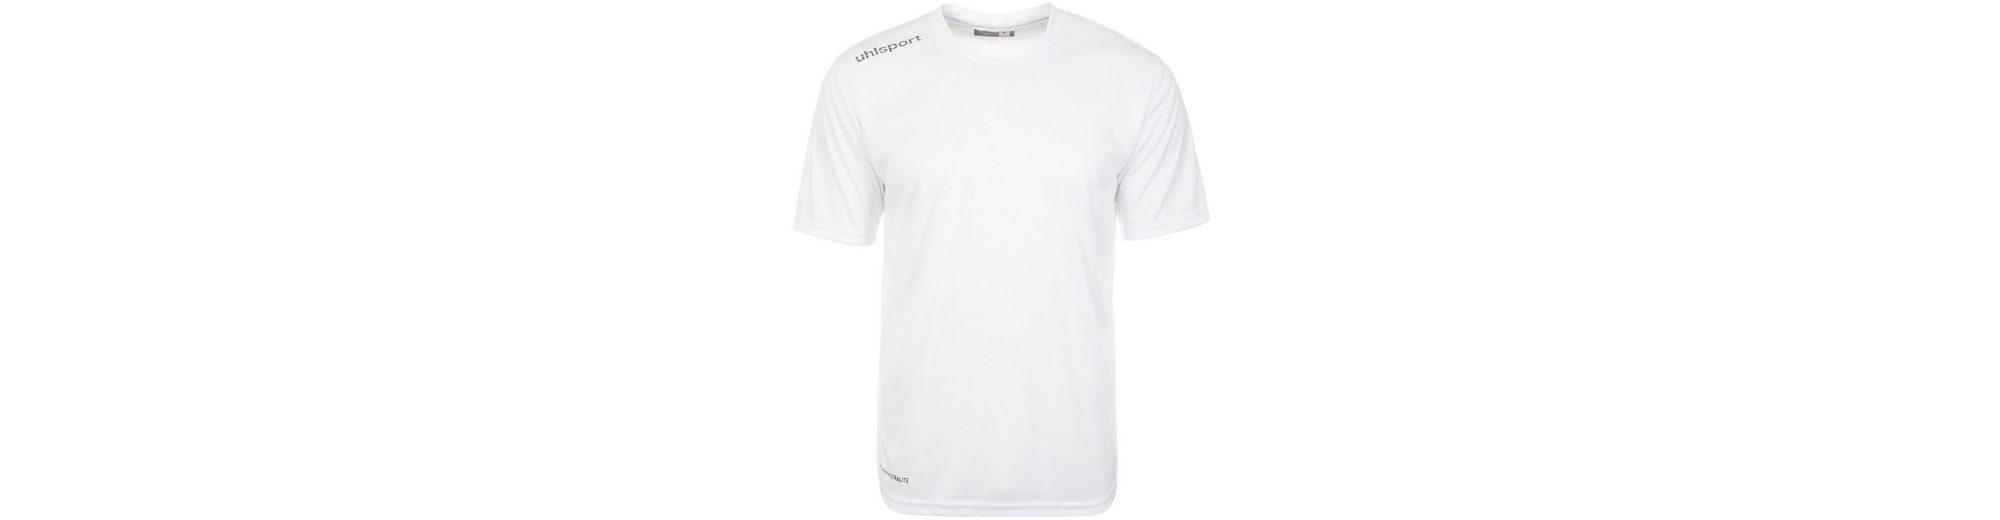 UHLSPORT Essential Polyester Training T-Shirt Herren Auslass Browse 1p7v09gug